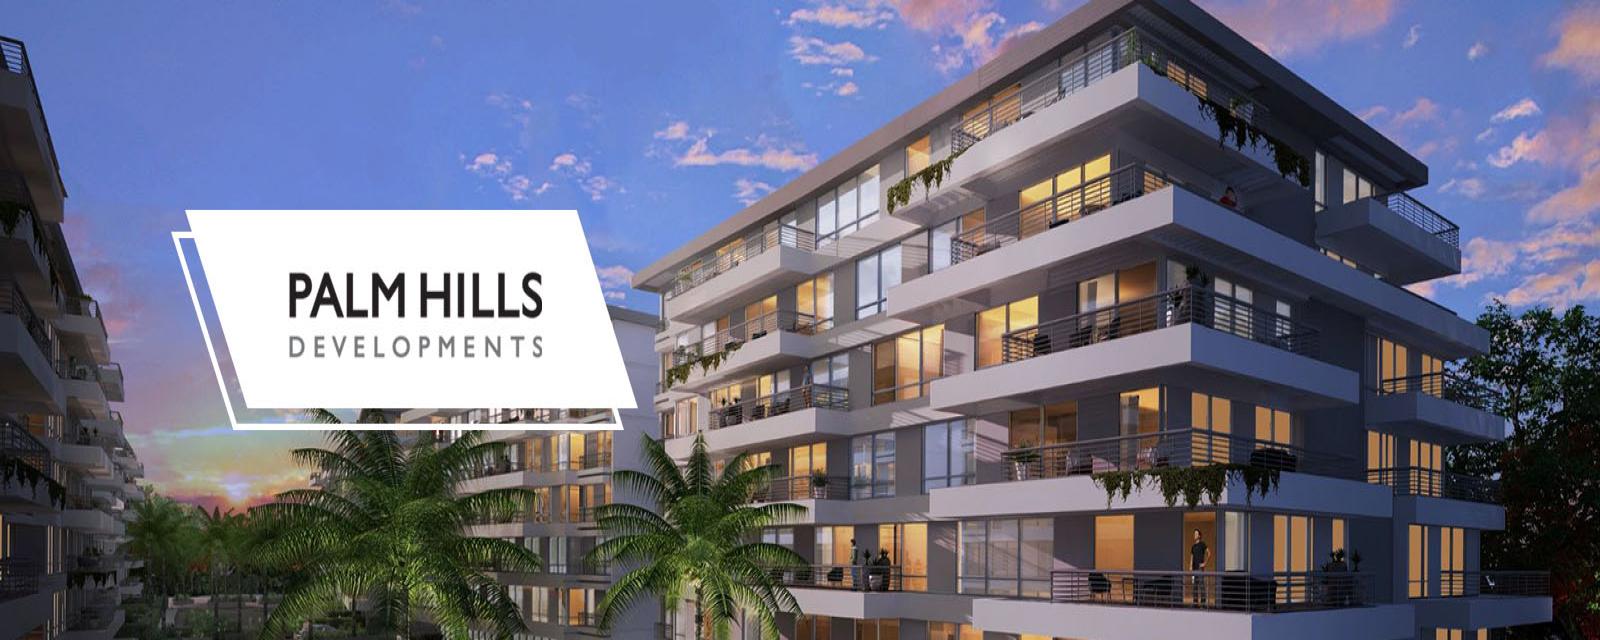 Palm Hills Coverphoto Flash Property